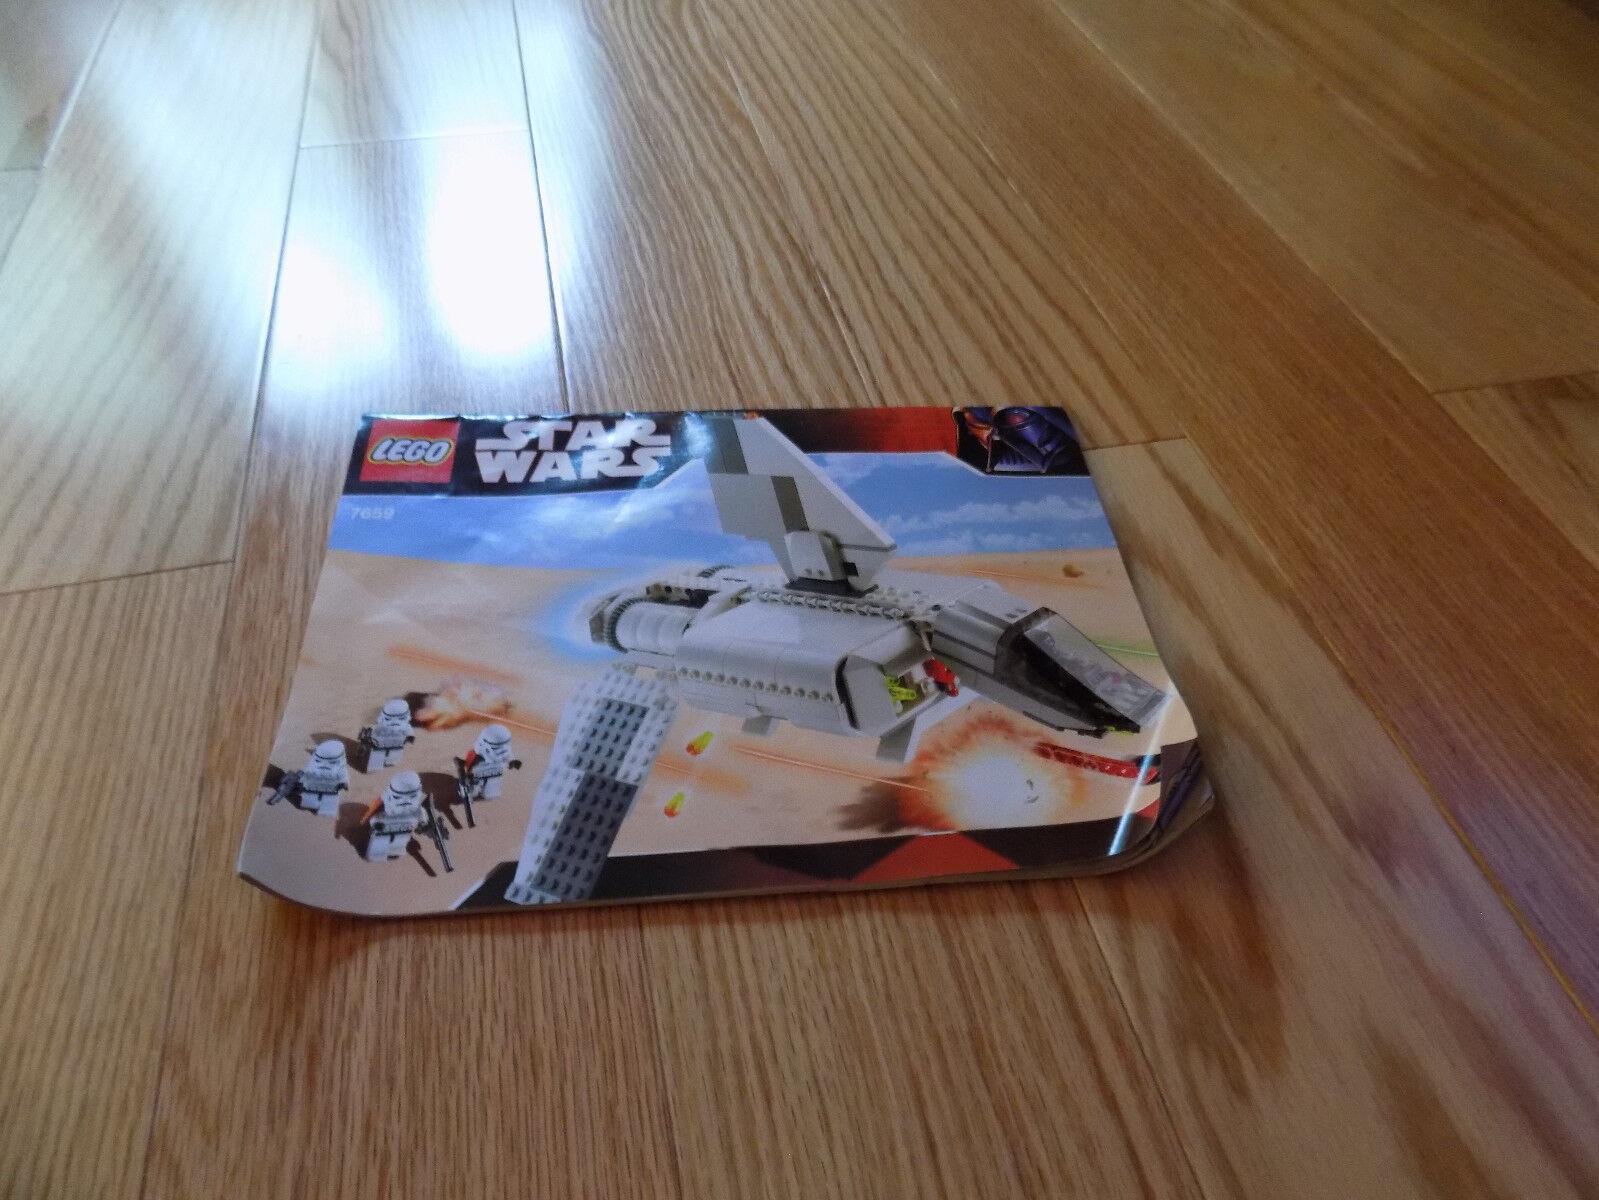 Lego Star Wars Imperial Landing Craft 7659 Ebay Yoda Kids Buildable Watch 8021032